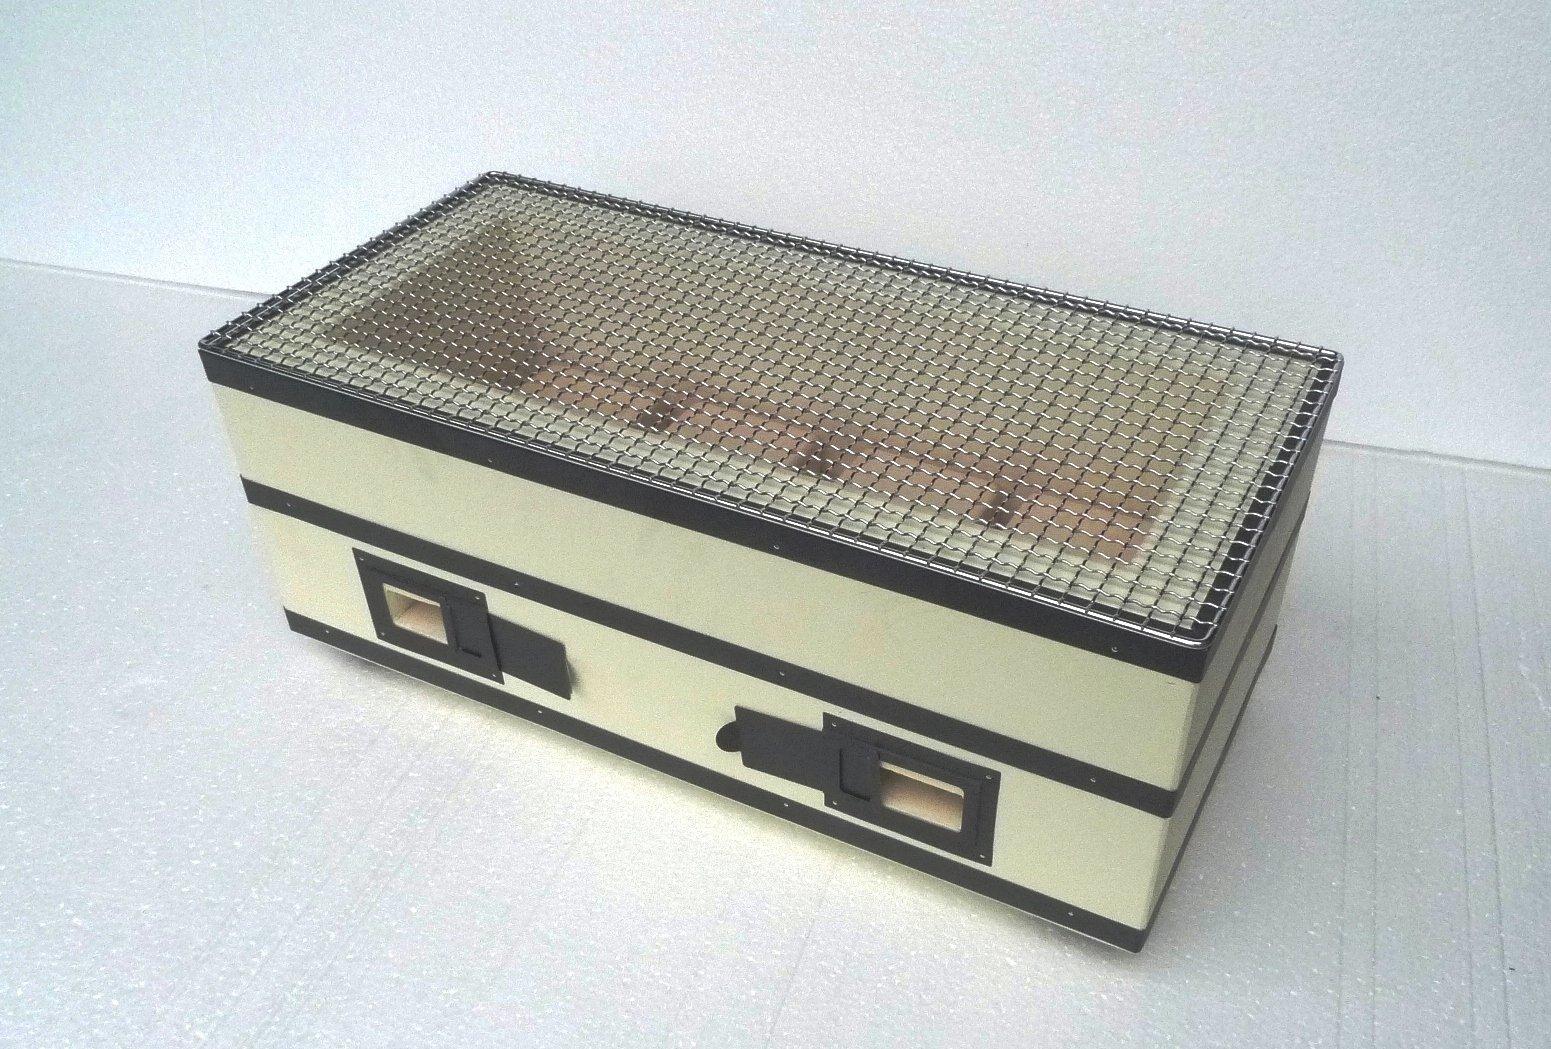 binchotan Japanese excellent charcoal konro grill/Hand made/Noto Ishikawa made